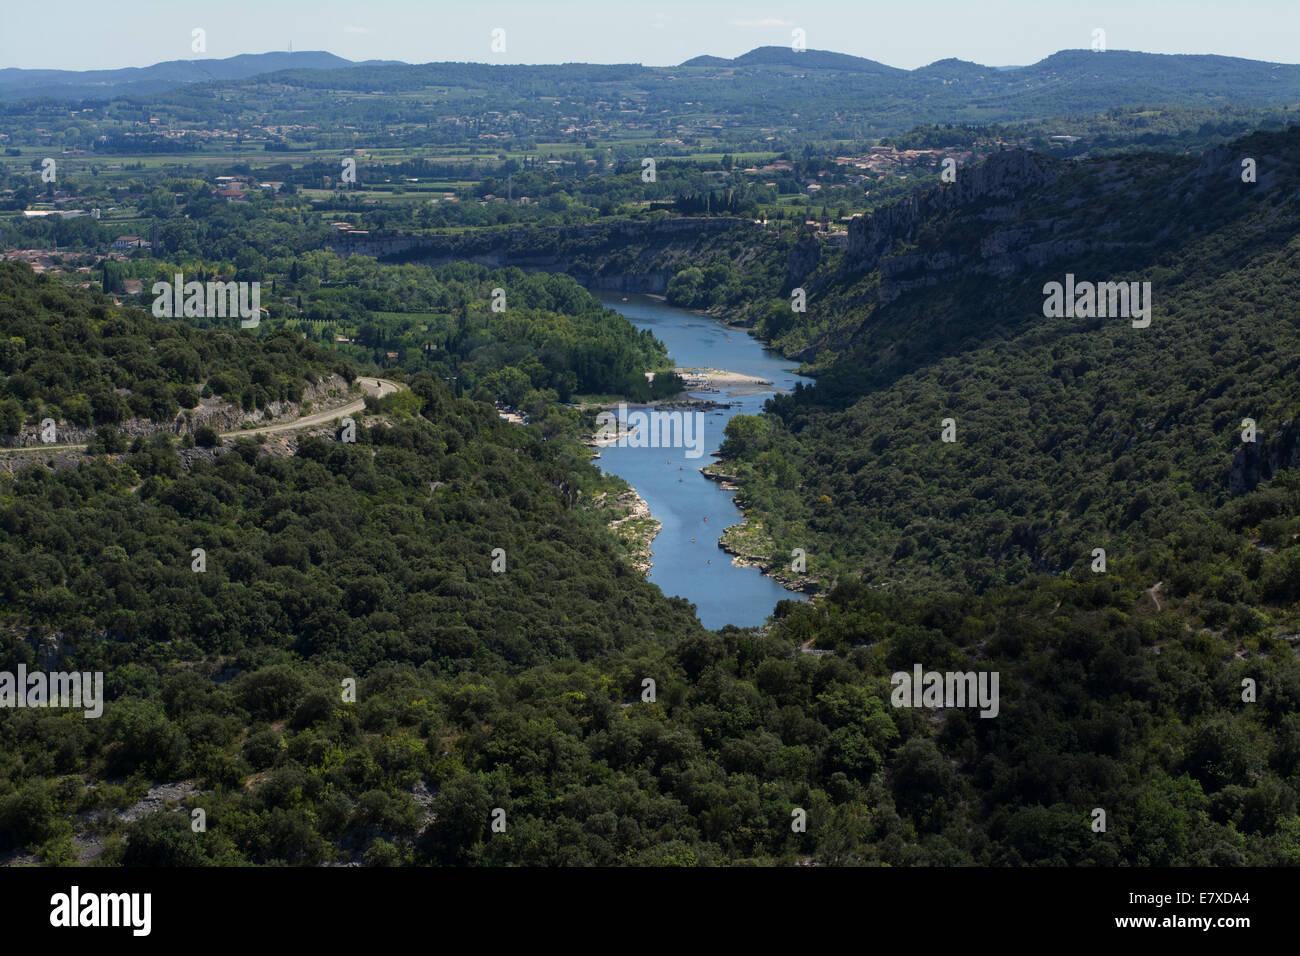 River Ardeche near village of Aigueze, Gard, languedoc-Roussillon, France, Europe. - Stock Image